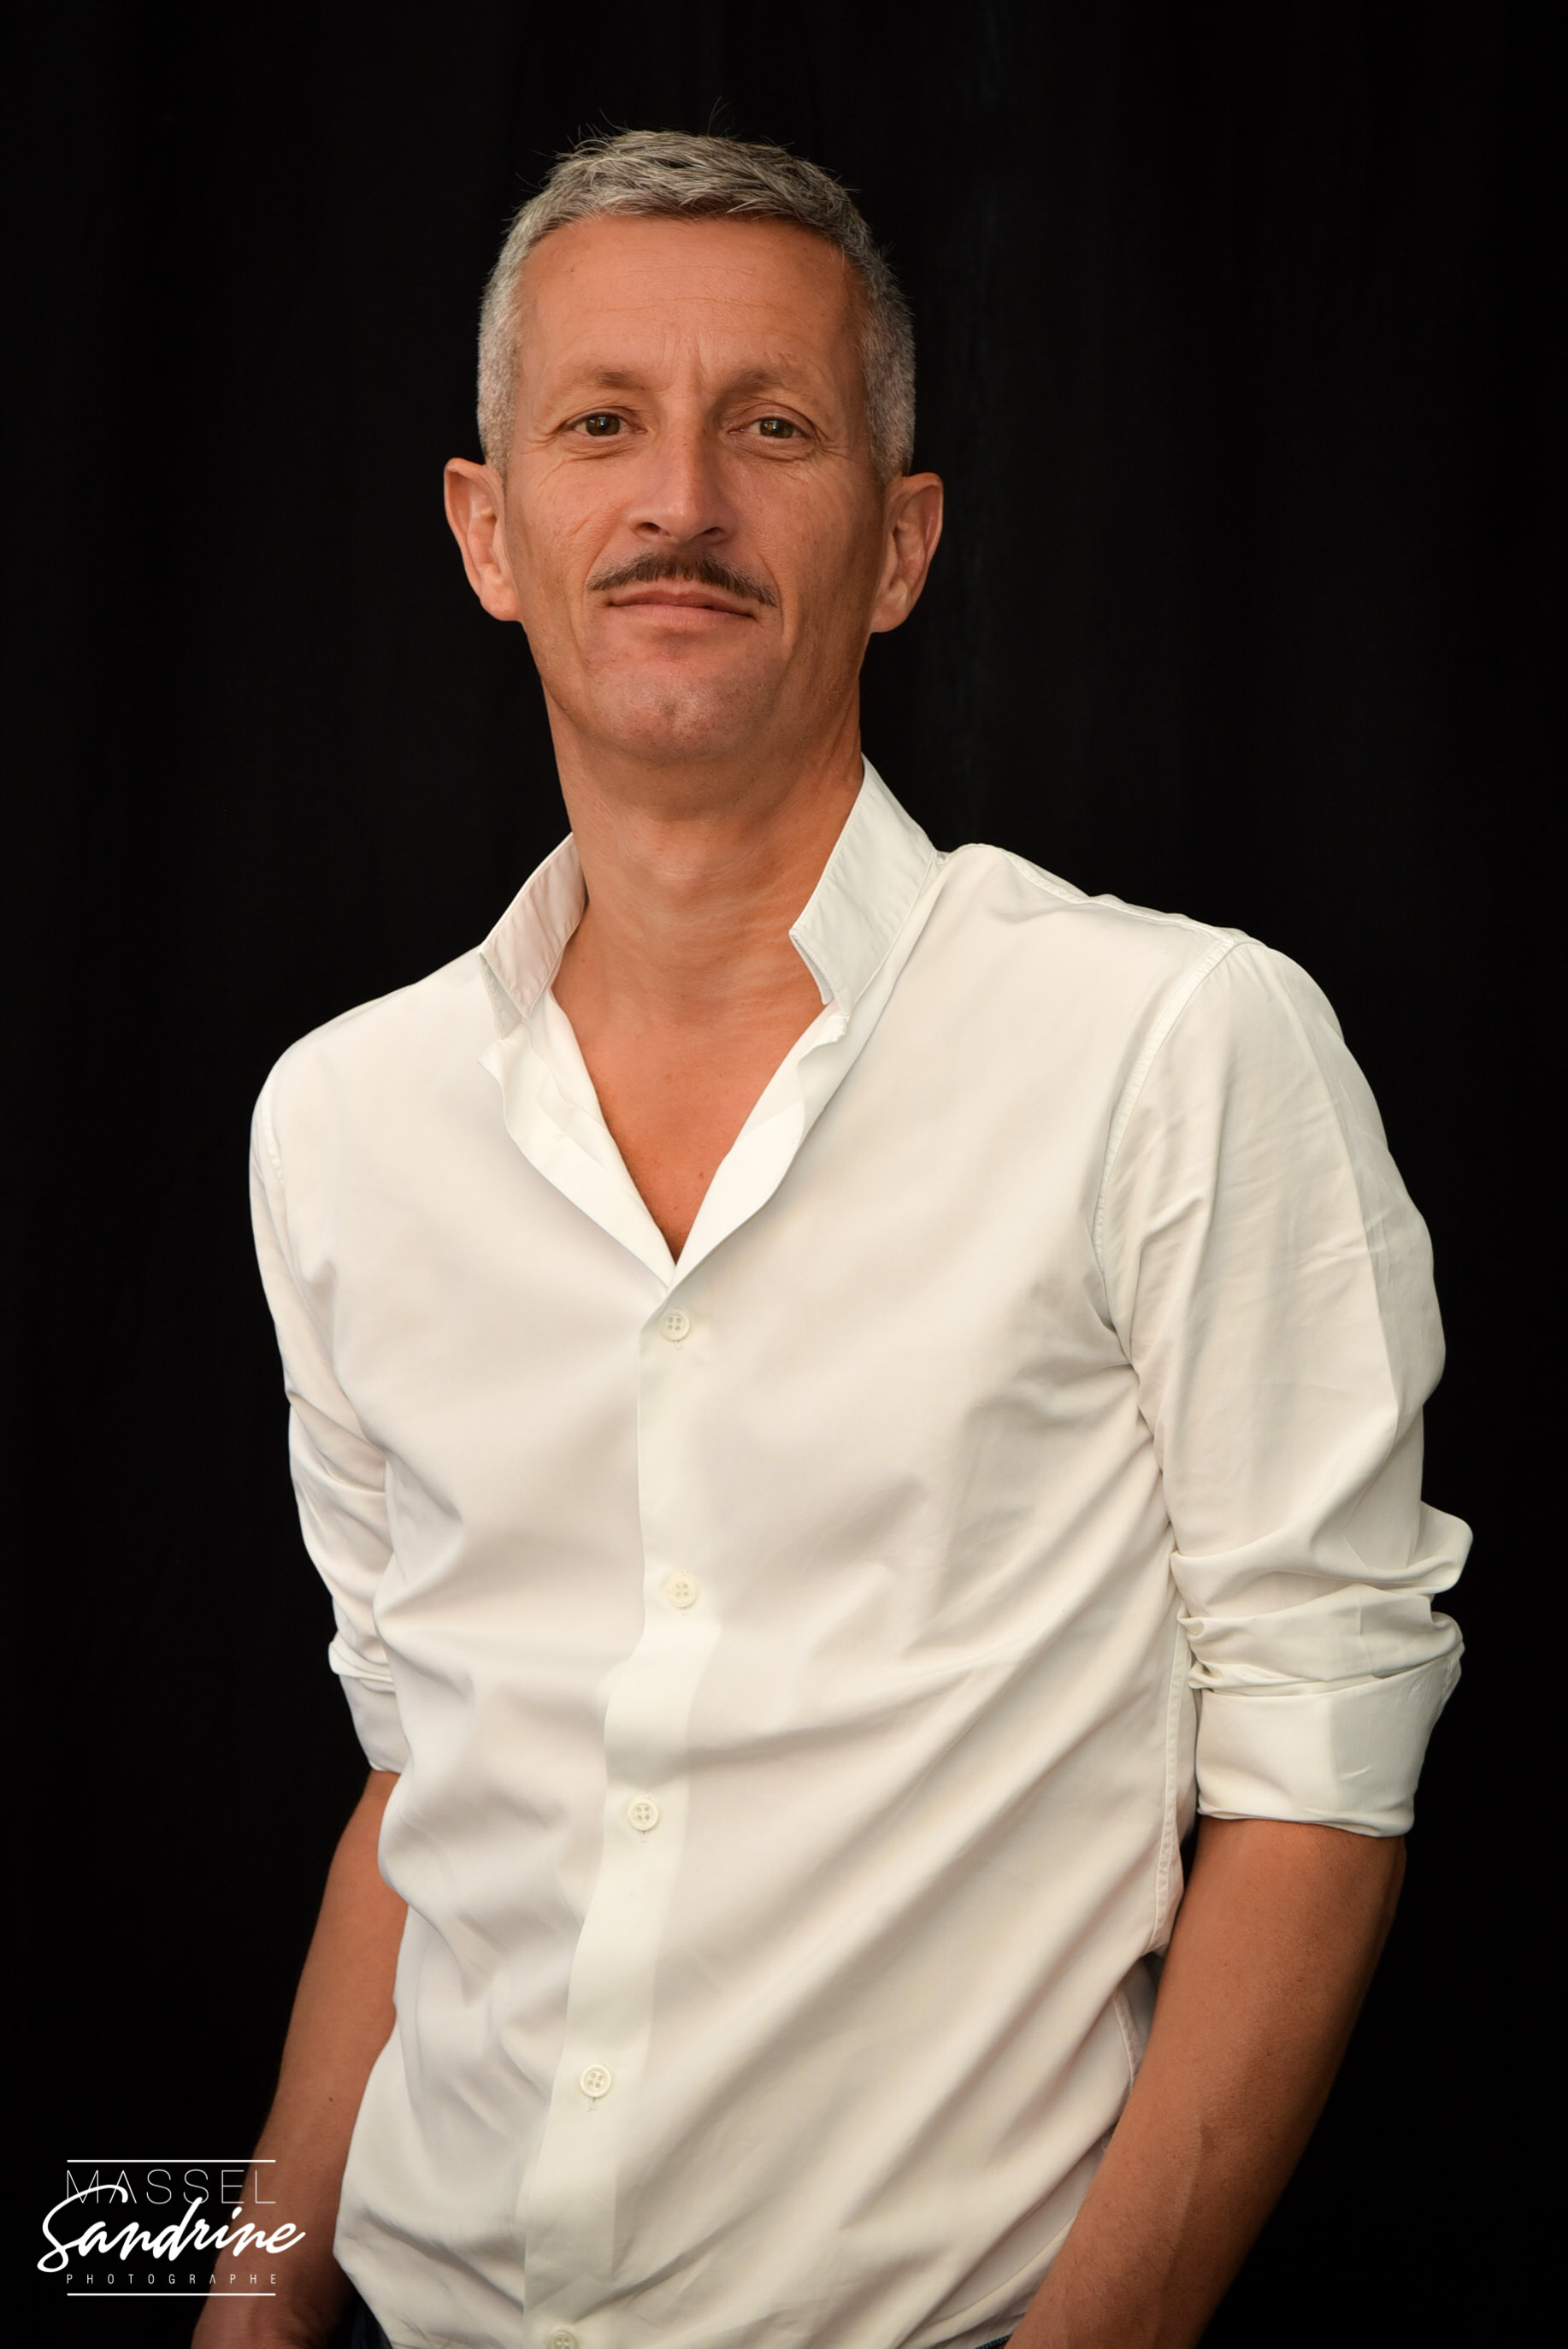 sandrine-massel-photographe-portrait-coach-sportif-etangdeberre-studio